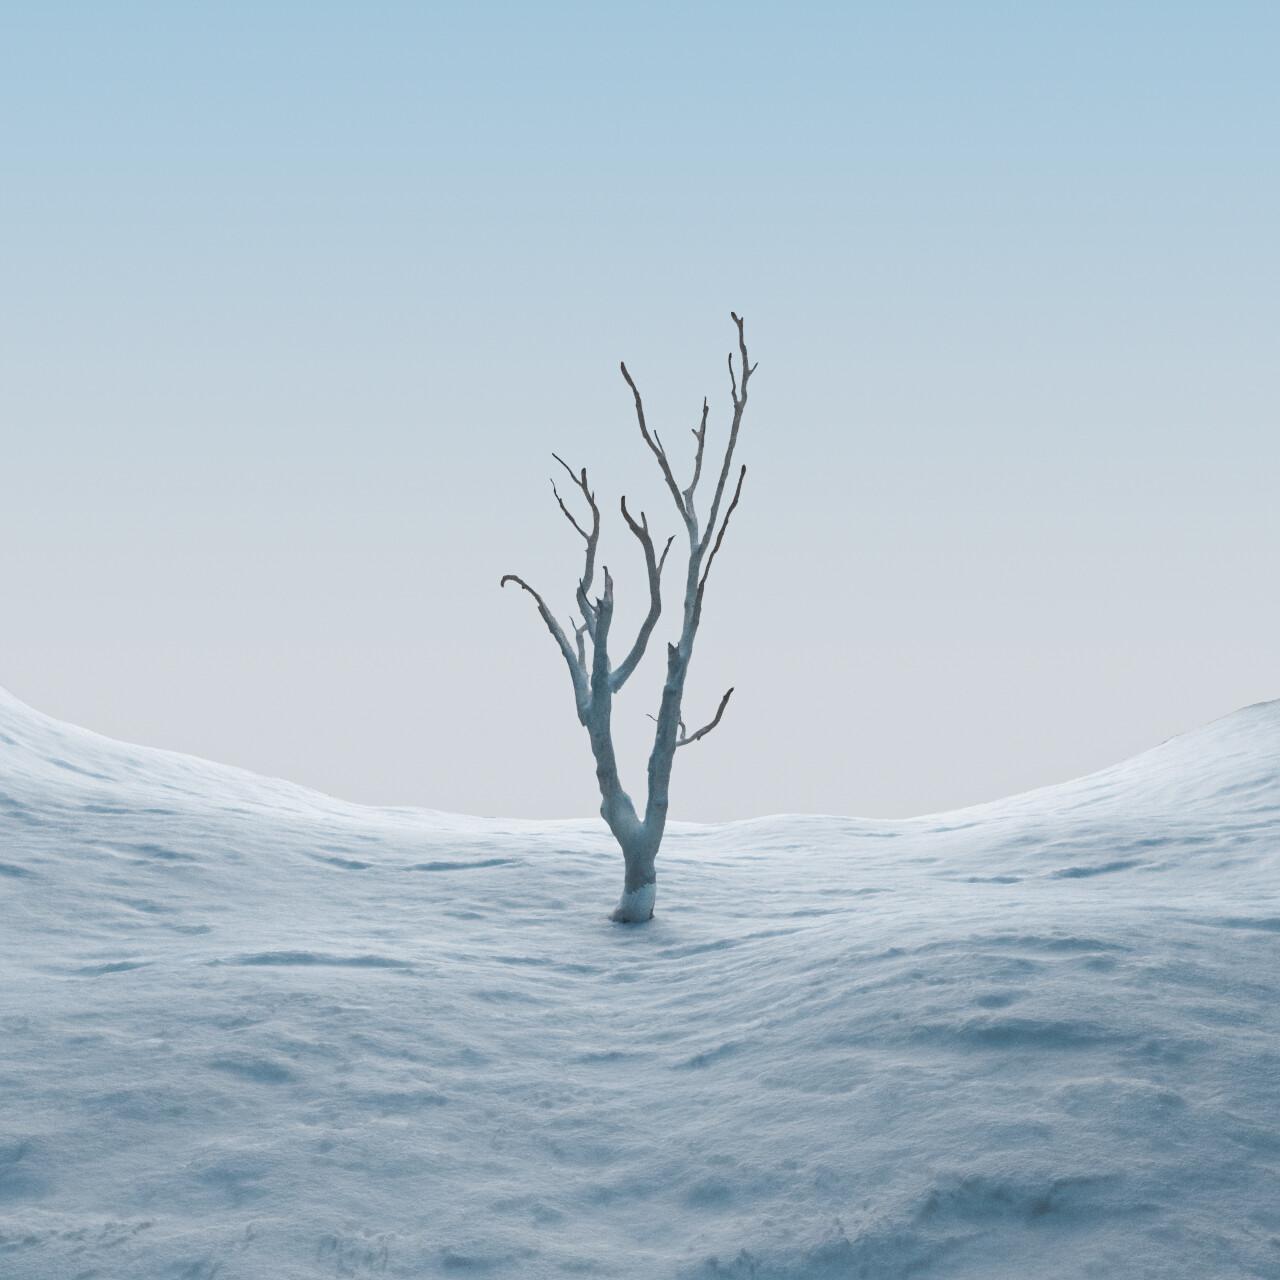 Concept #1 created while exploring animation idea